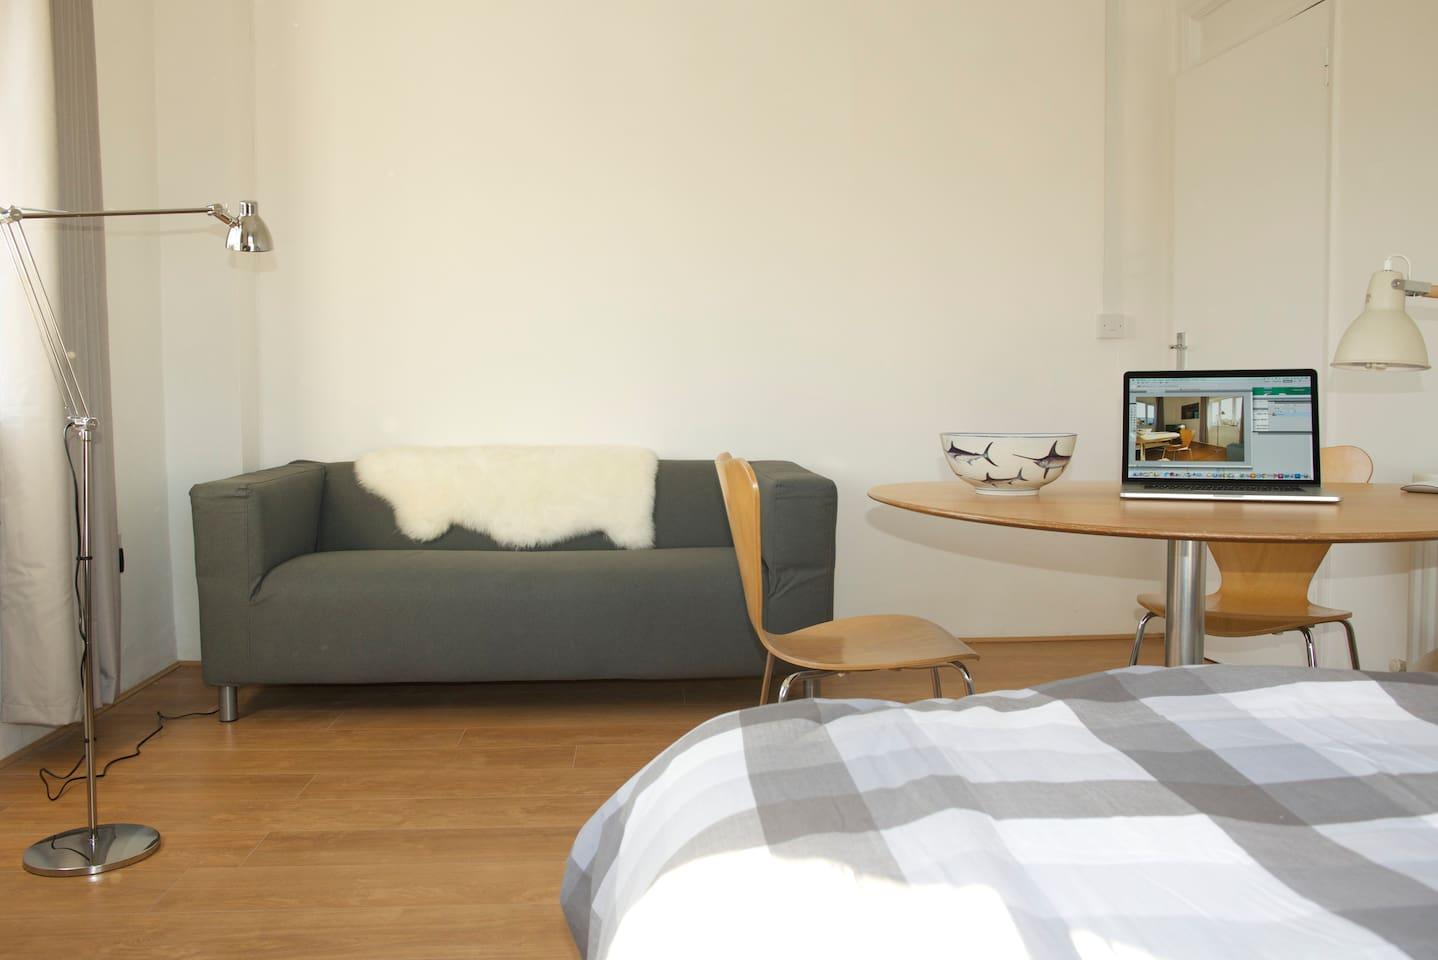 Studio Apartment - sofa, table, double bed, tv etc - one room